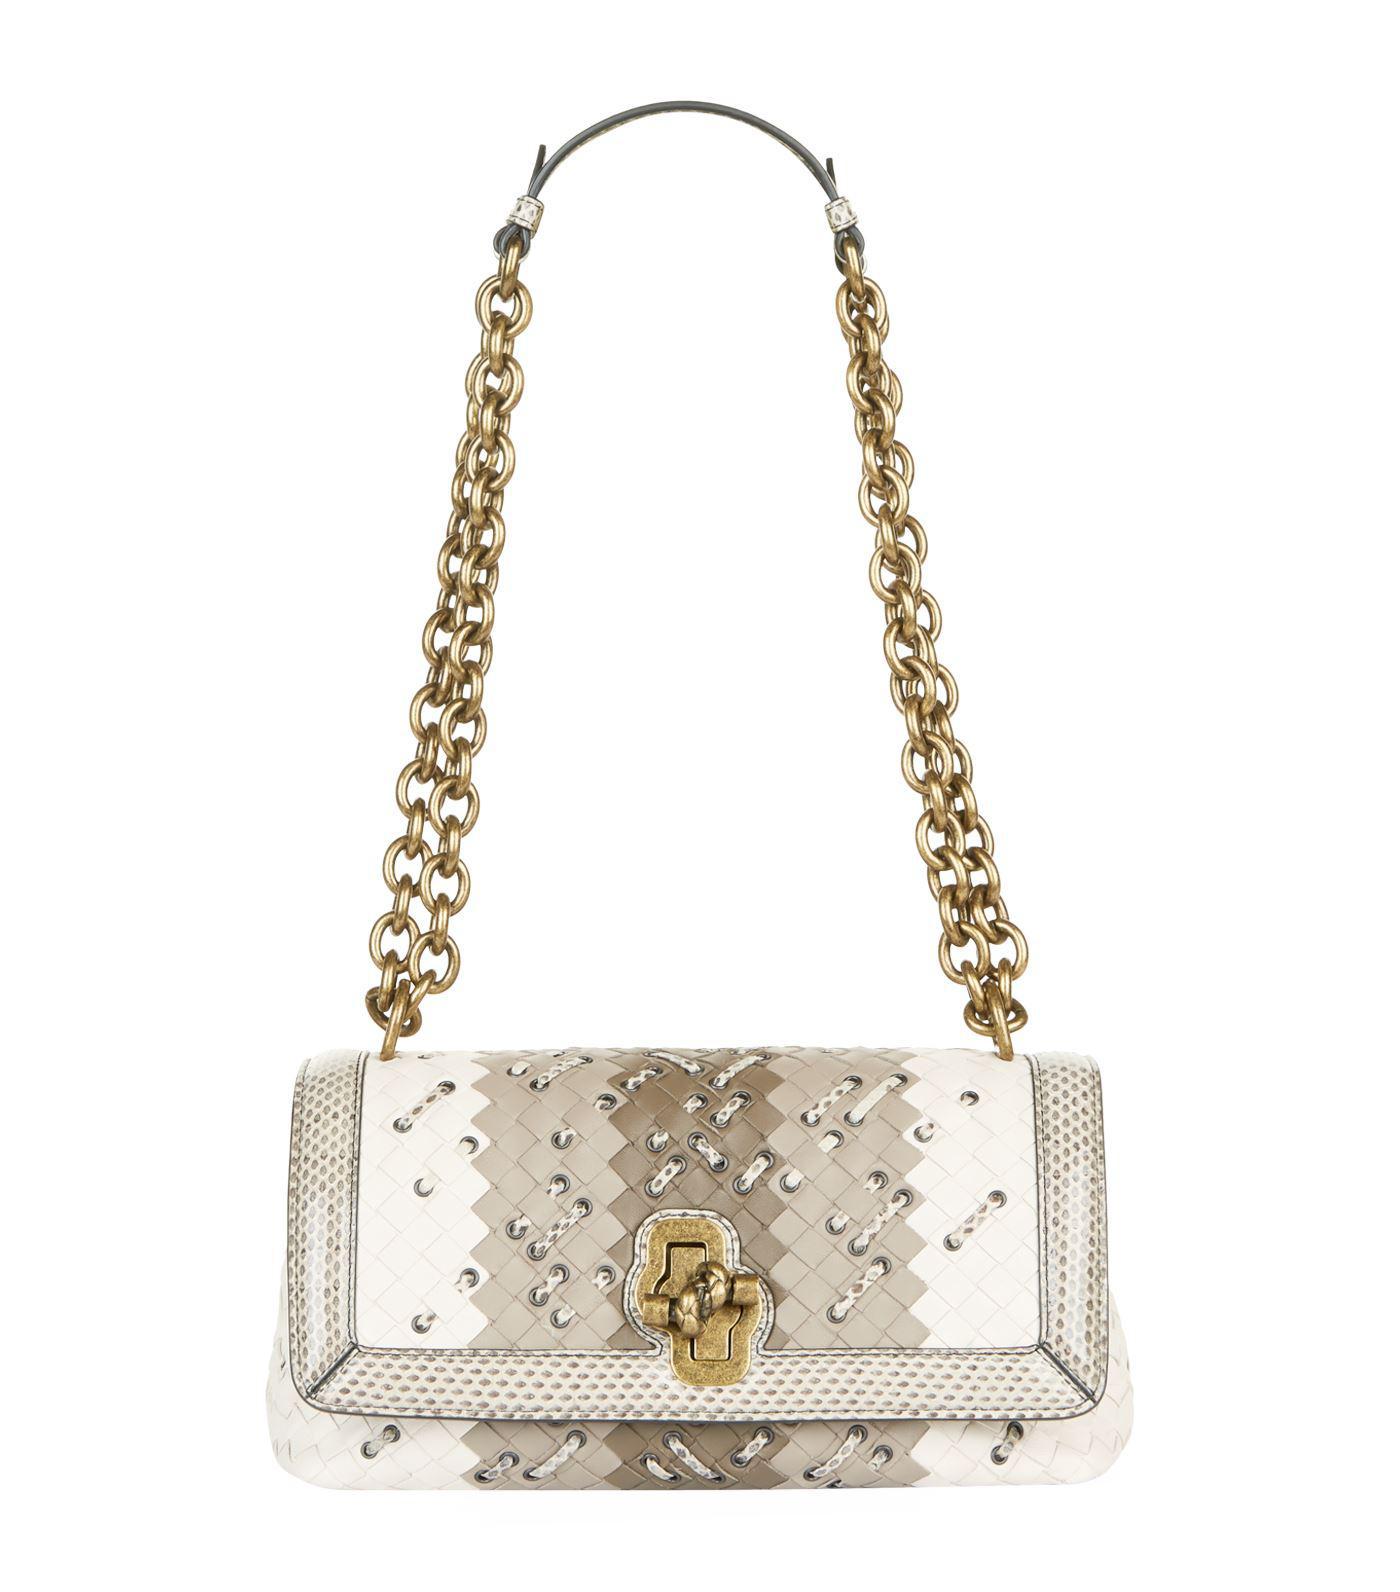 fb82b6e792 Lyst - Bottega Veneta Club Stitch Olimpia Knot Bag in White